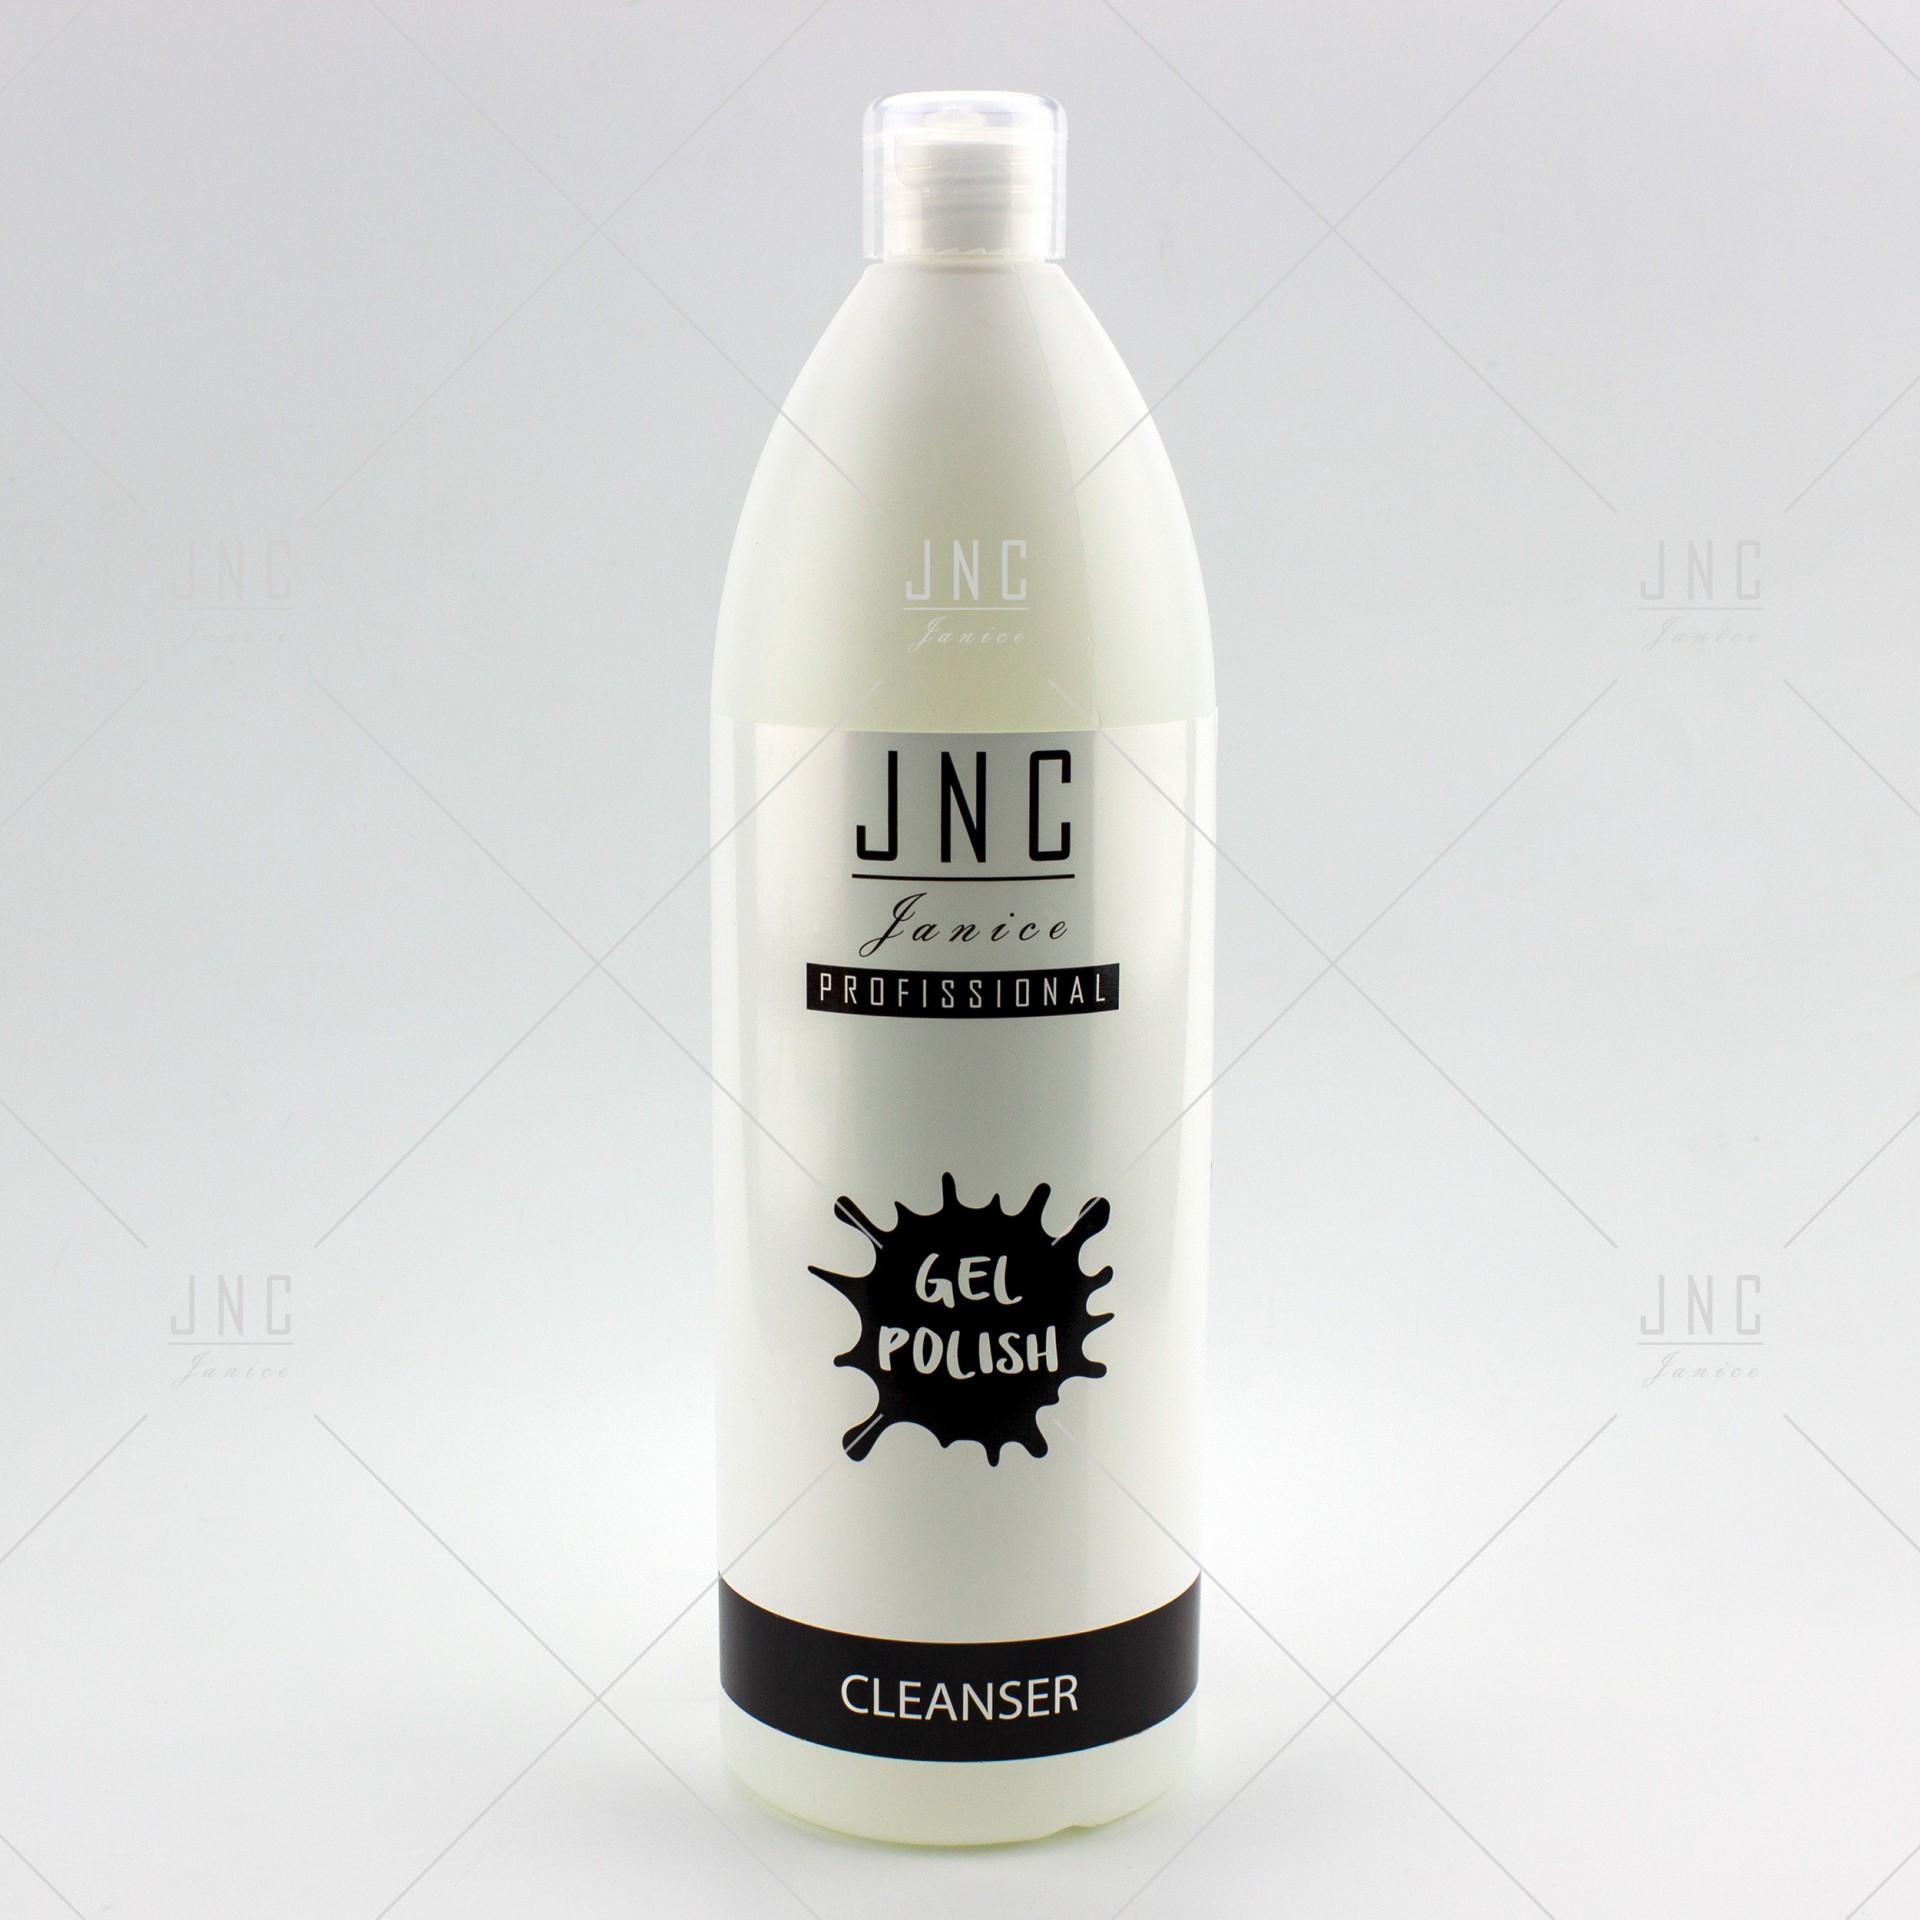 Cleanser - JNC Profissional 1000ml | Ref.19060087